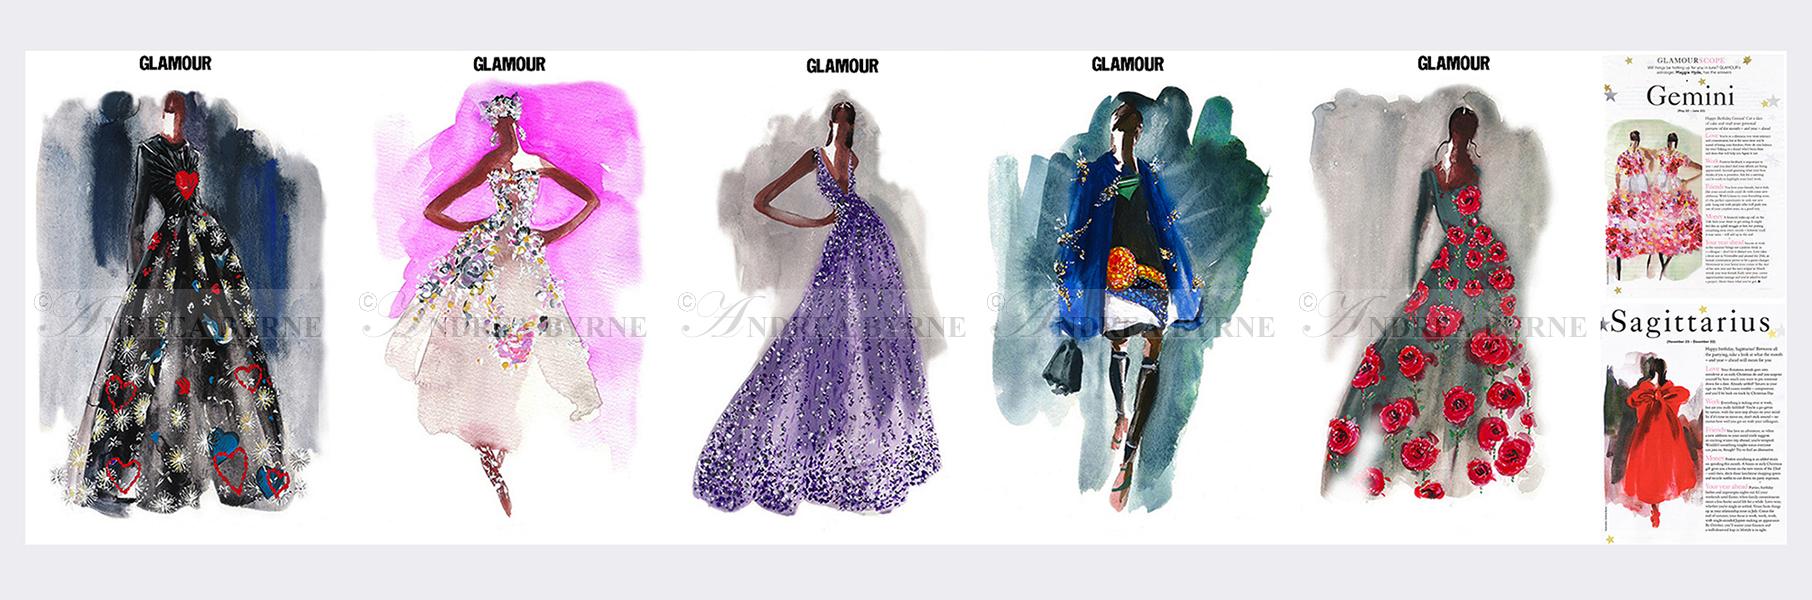 Conde Nast Glamour magazine (selected couture horoscope illustrations) - Libra (Celine) / Taurus (Dolce & Gabbana) / Aries  (Monica Lhuillier) / Scorpio (Prada) / Pisces (Prada) (2015)